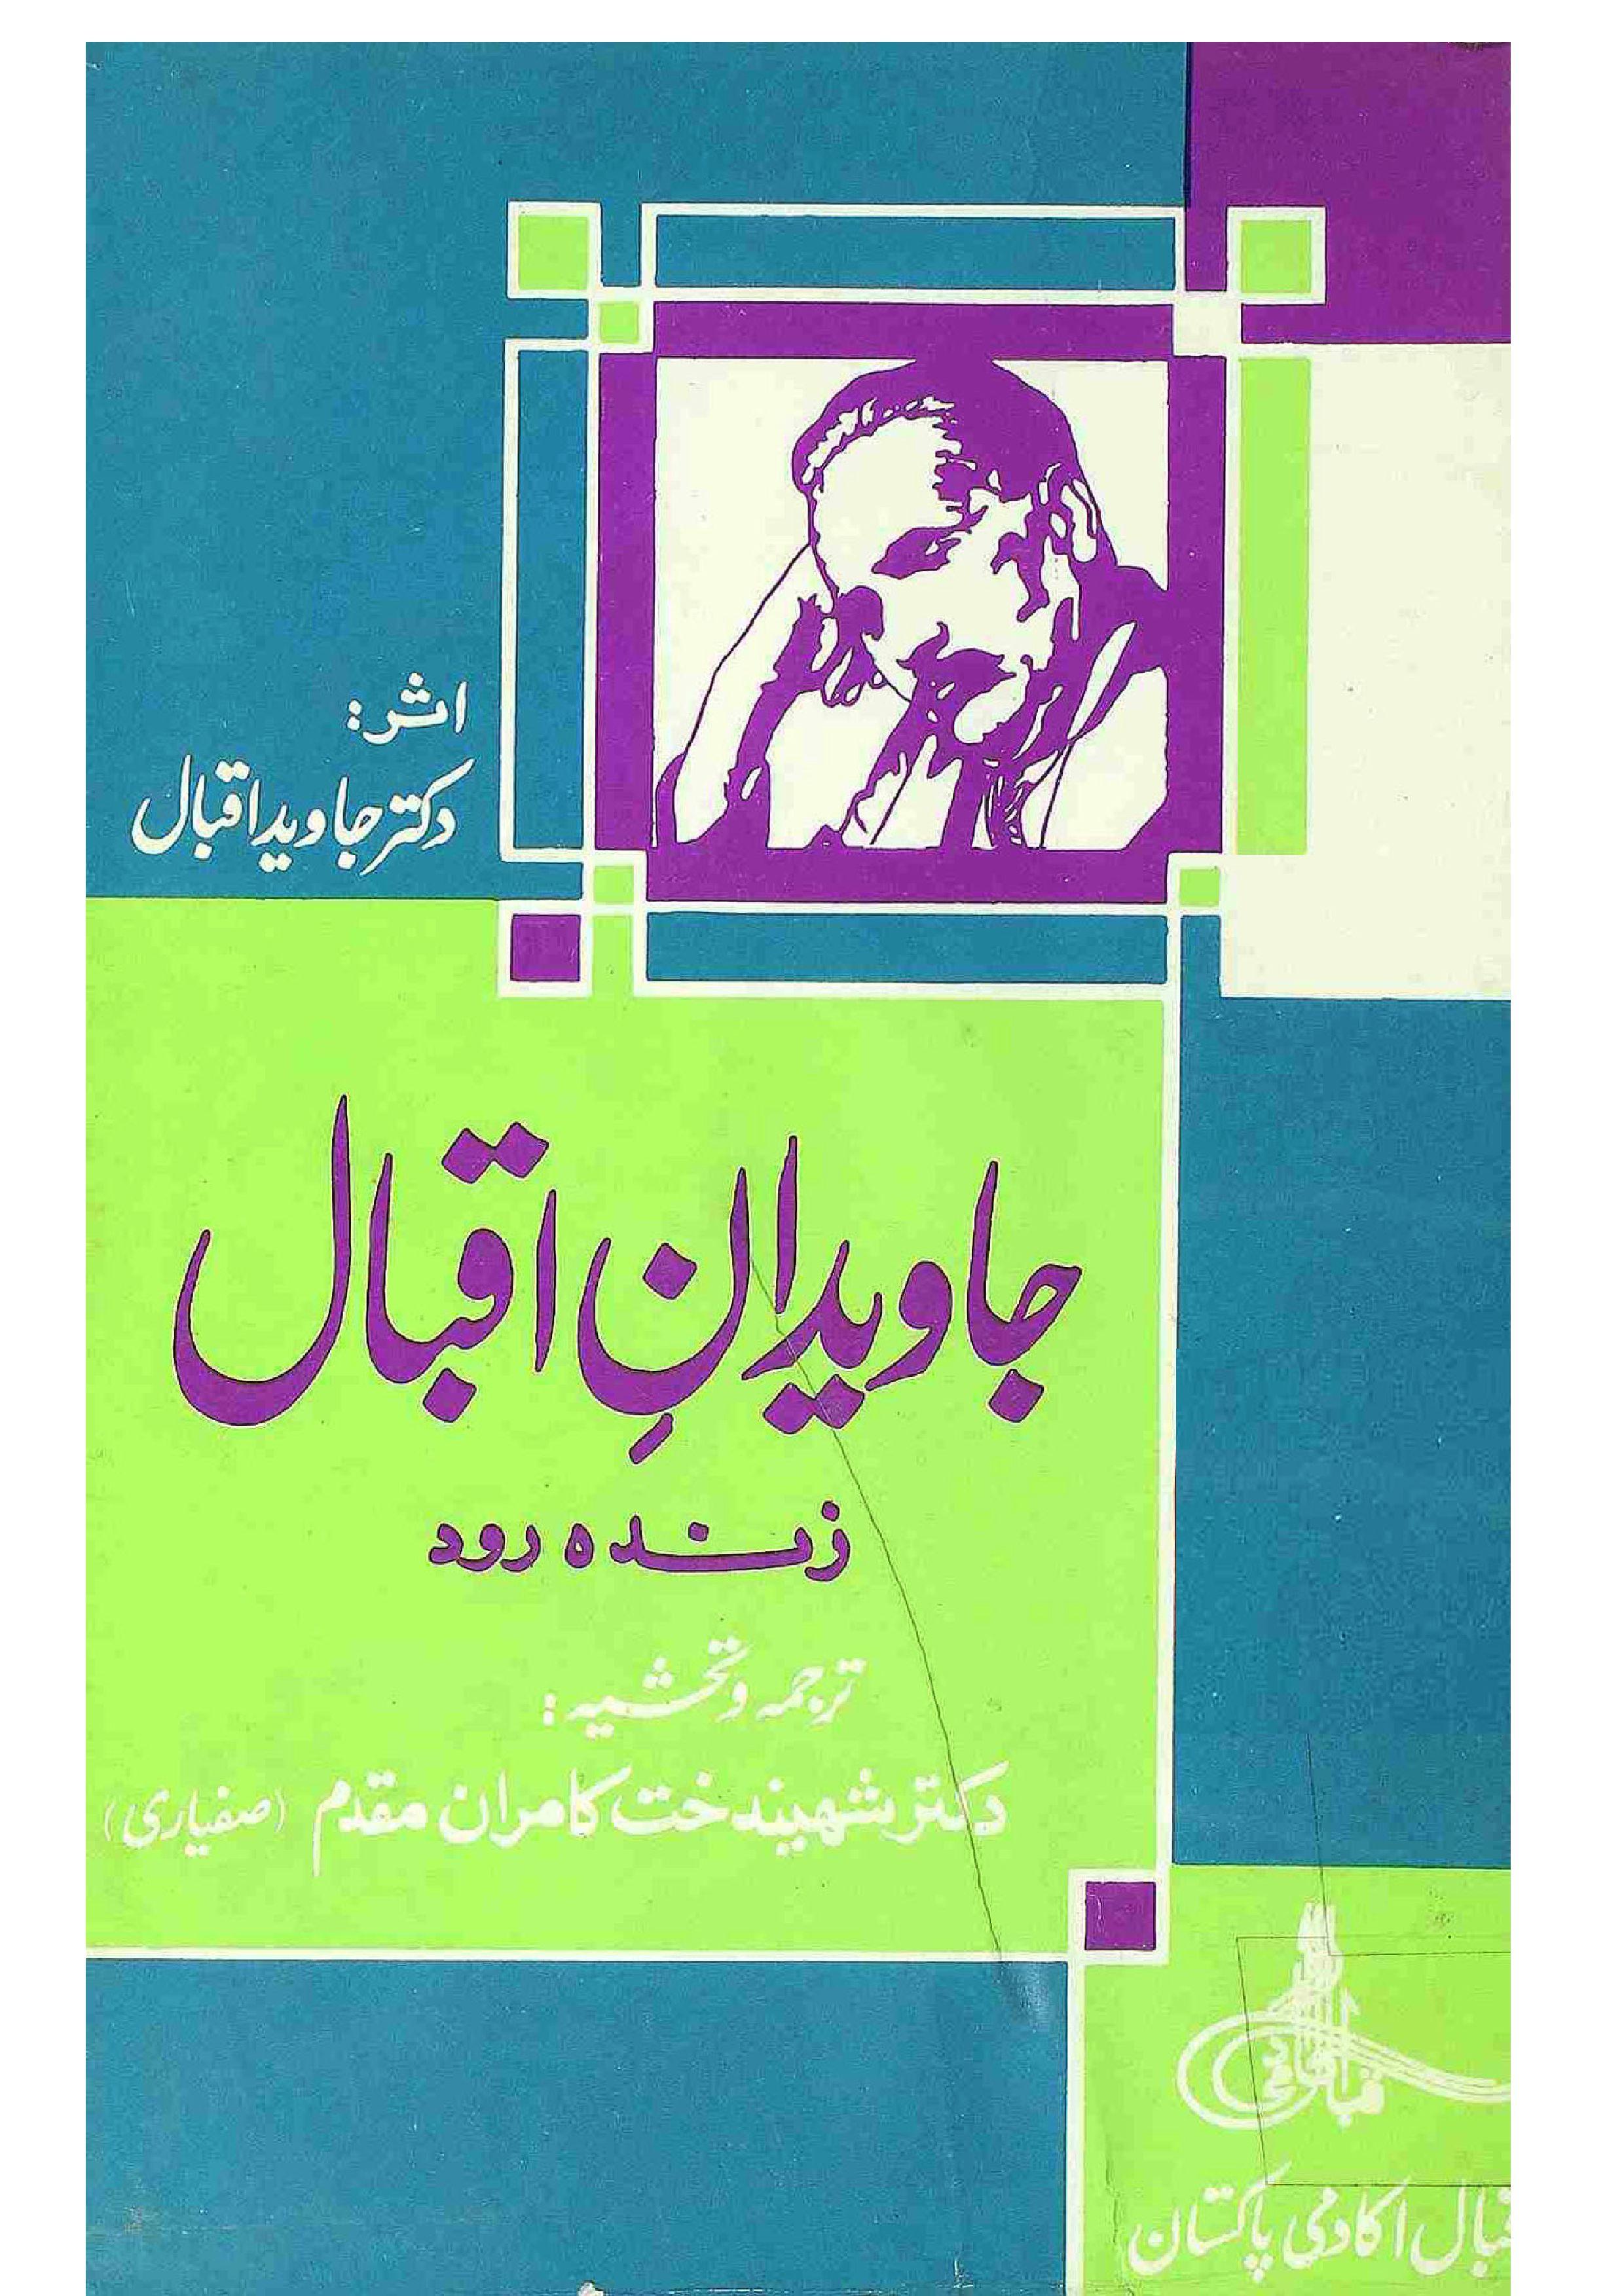 Jawedan-e-Iqbal     Zindagi Nama-e-Allama Iqbaal